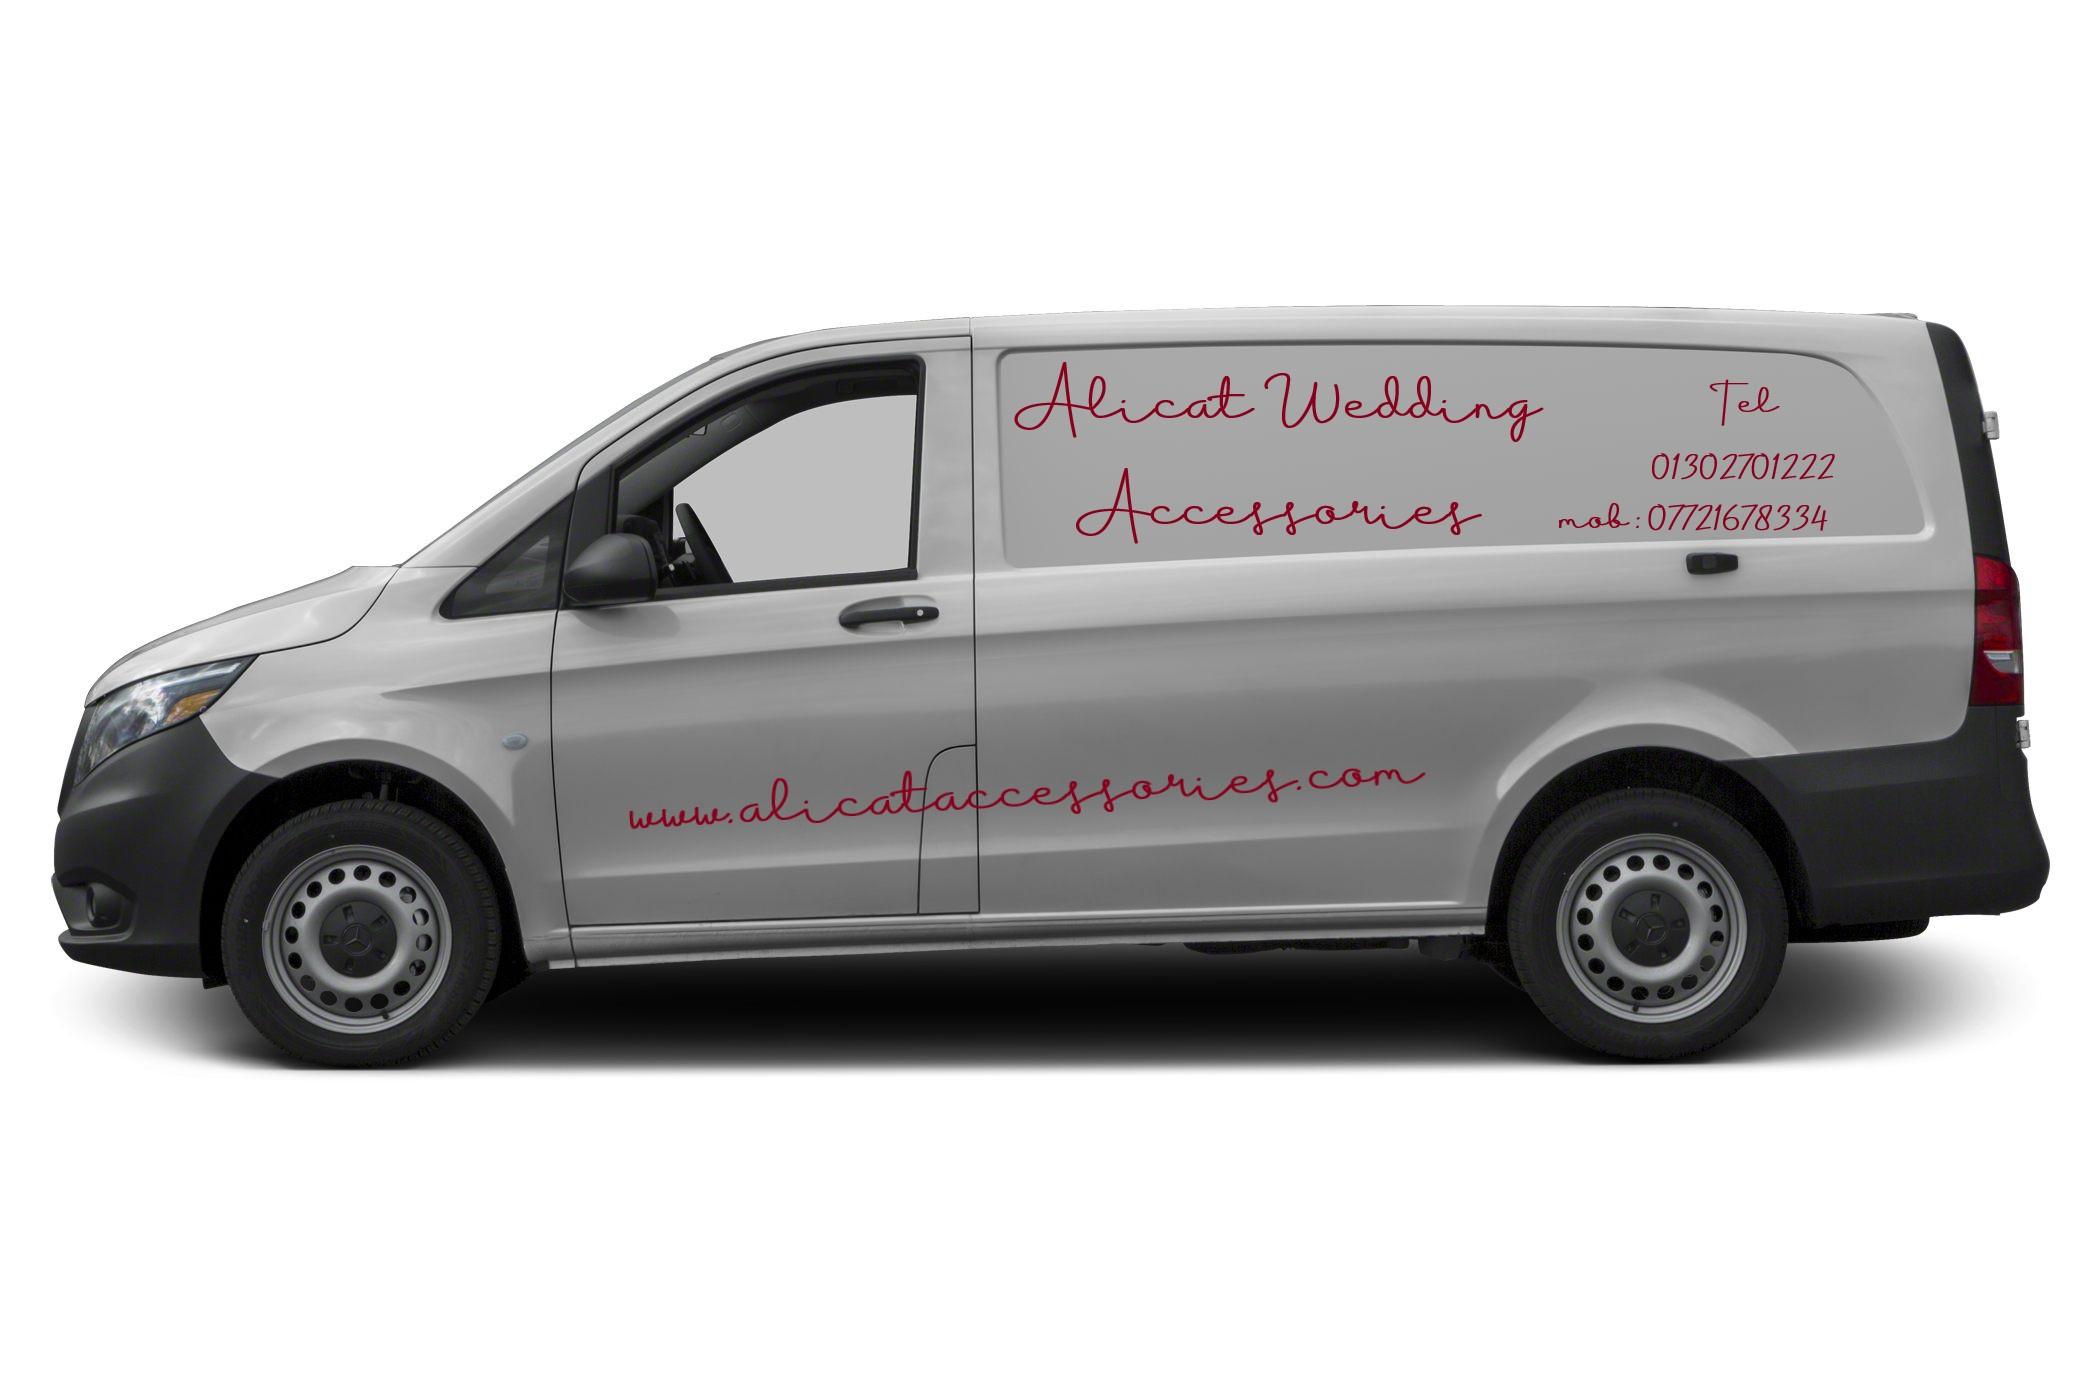 https://0201.nccdn.net/1_2/000/000/181/c3b/2016-Mercedes-Benz-Metris-Class-Minivan-Van-Base-Metris-Cargo-Van-Photo-10.png-2100x1386.jpg